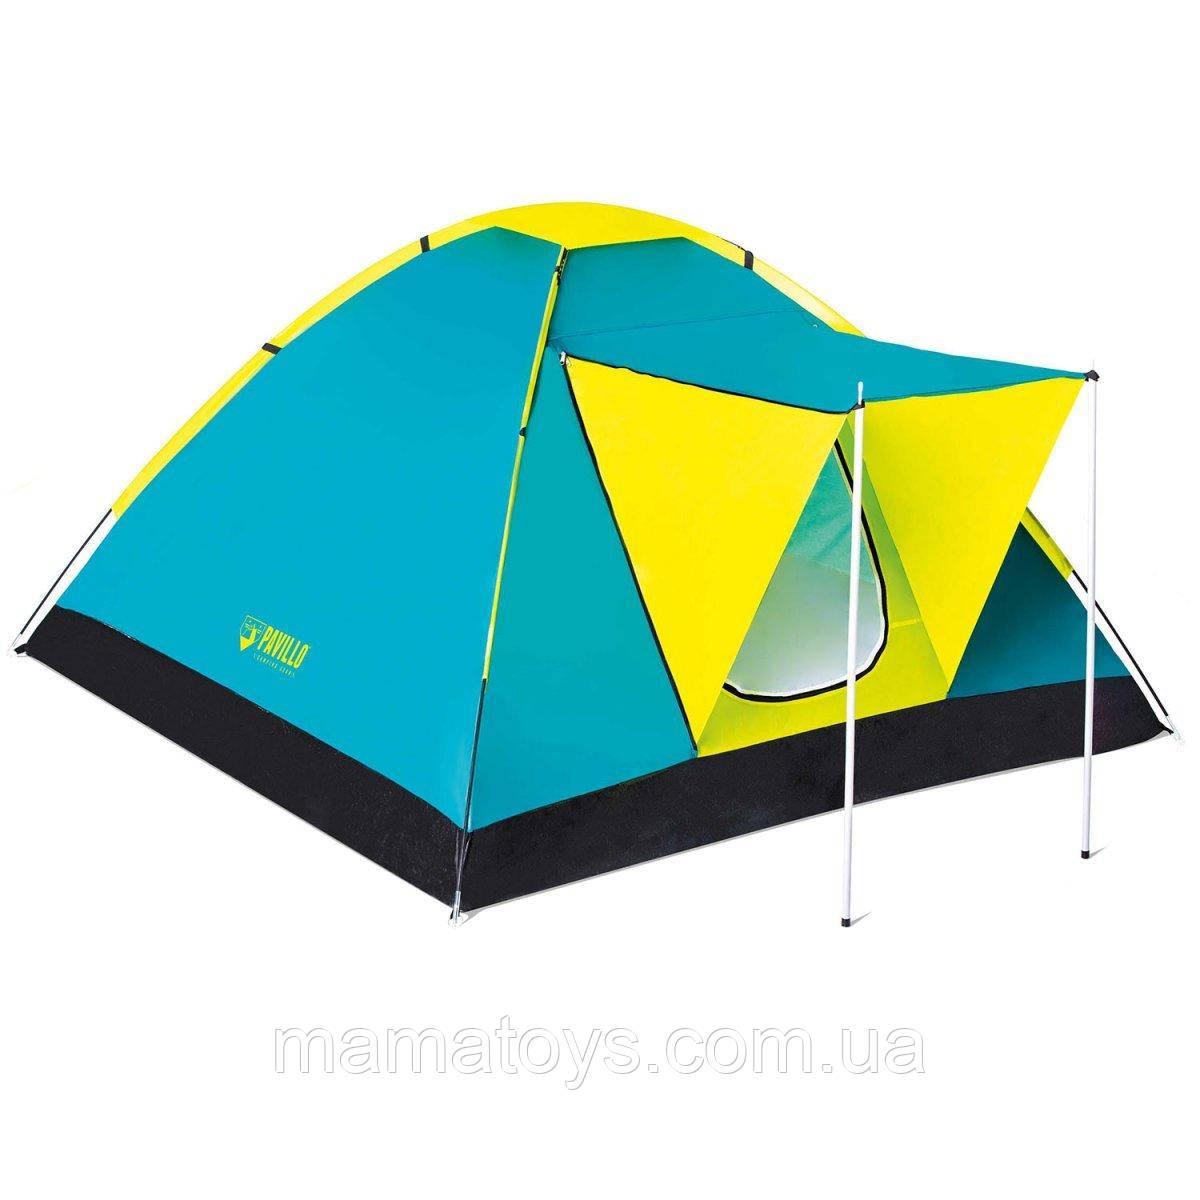 Палатка Туристическая Трехместная Pavillo BW 68088 Cool Ground 3 Размеры210 х 210 х 120 см Бествей BestWay